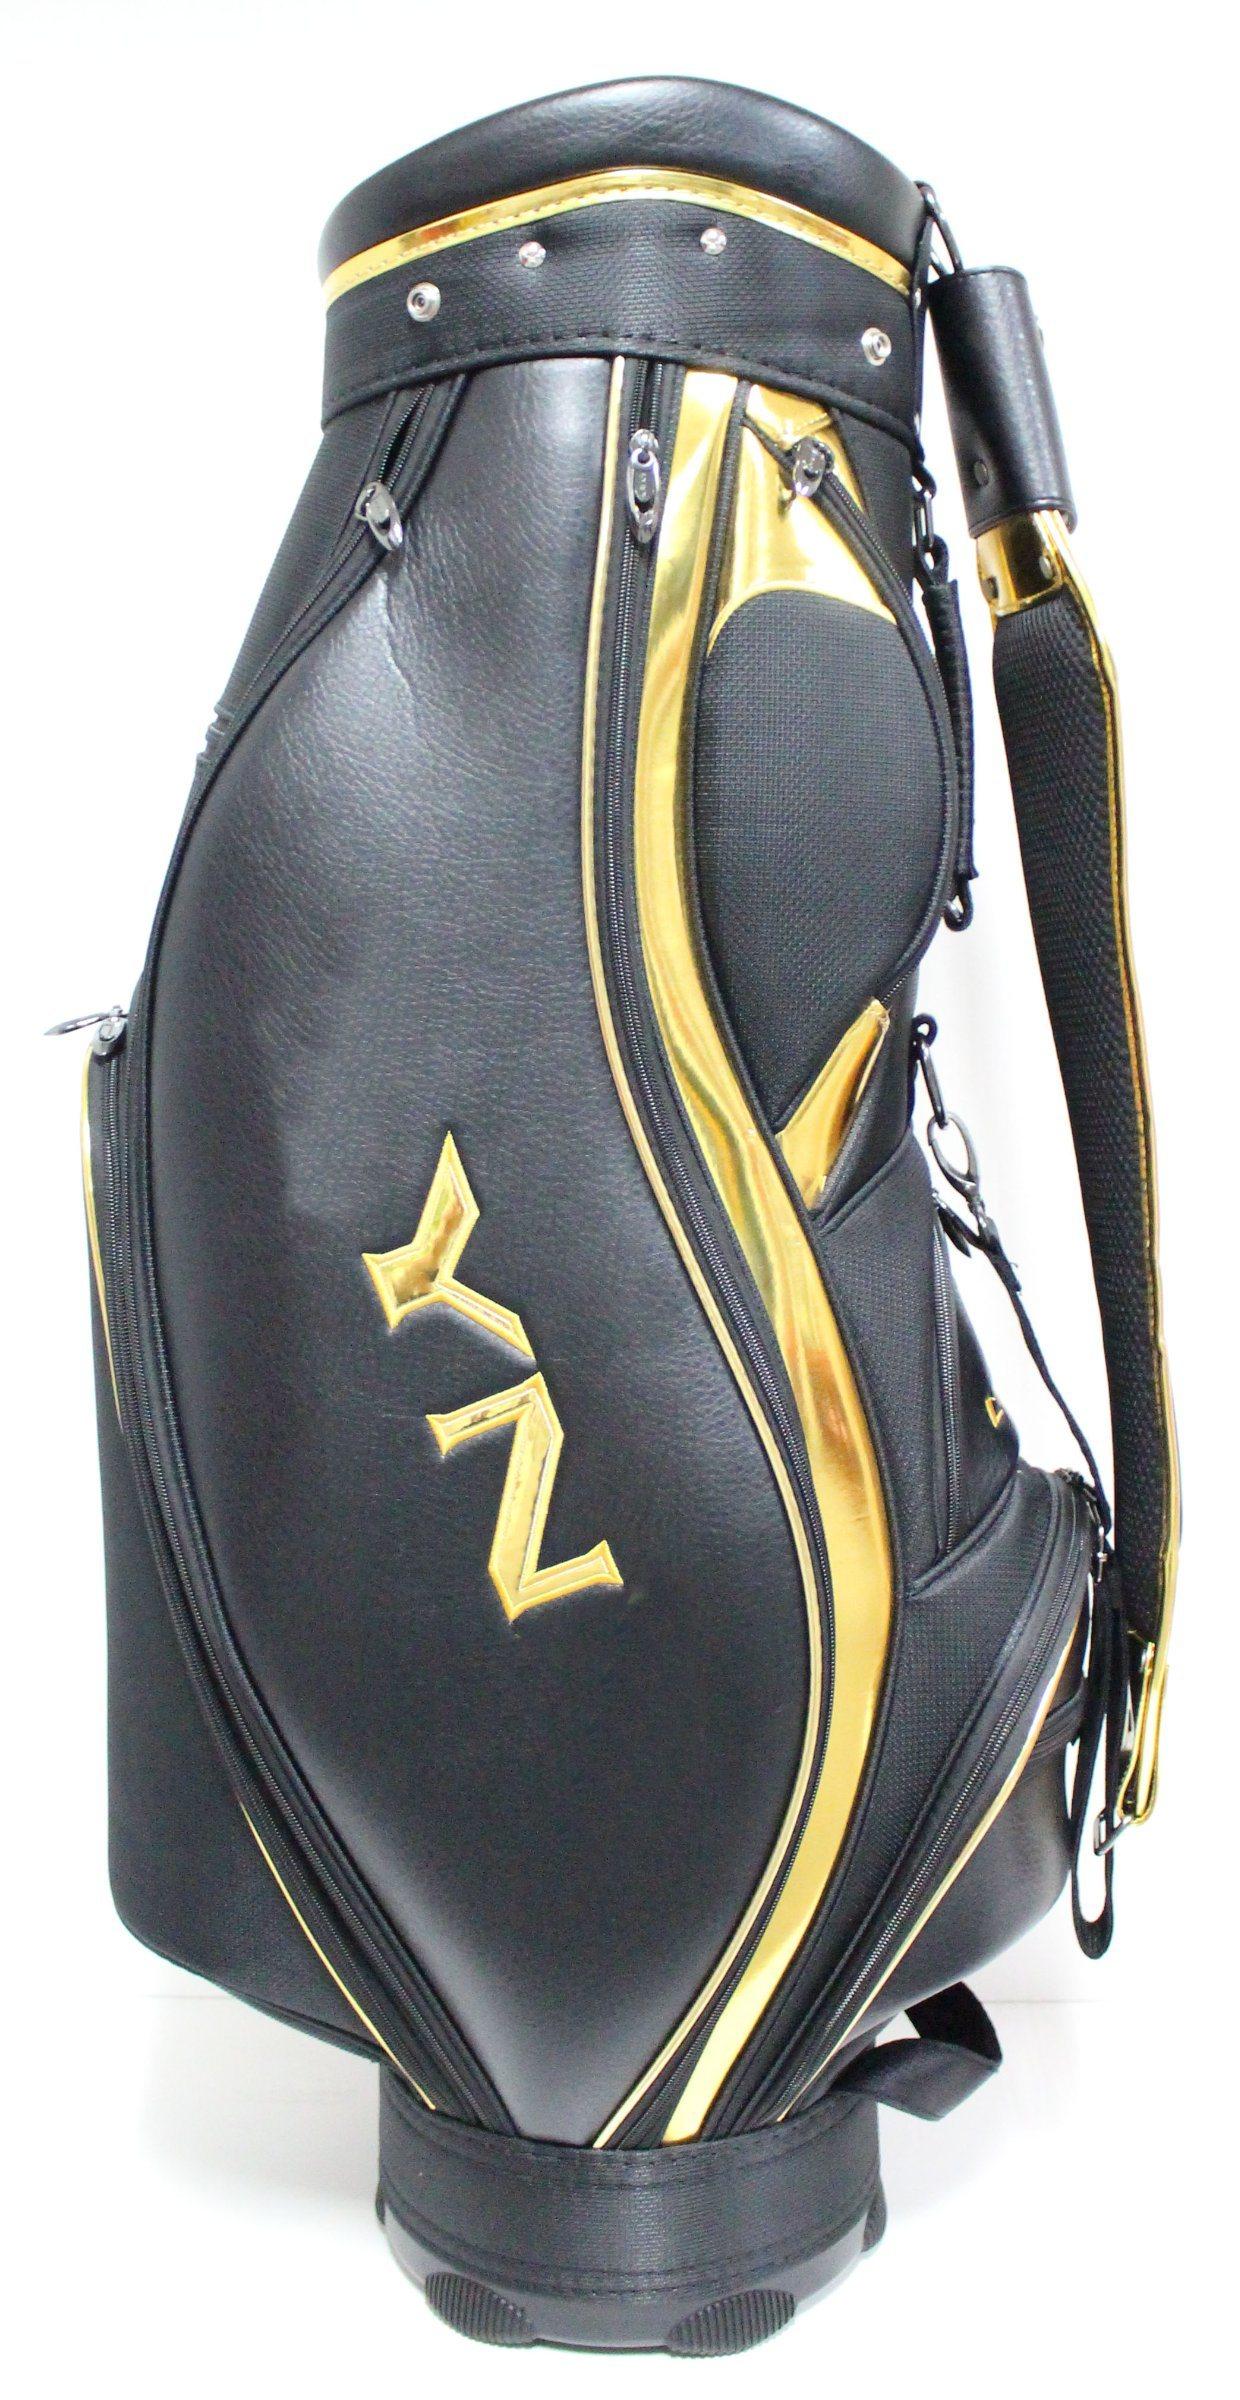 PU High Quality Hot Sale Golf Staff Bag